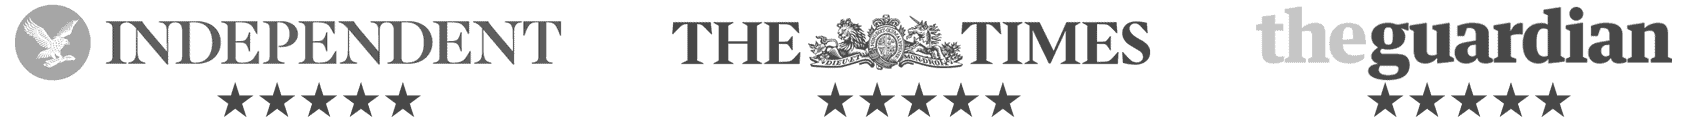 reviews-1